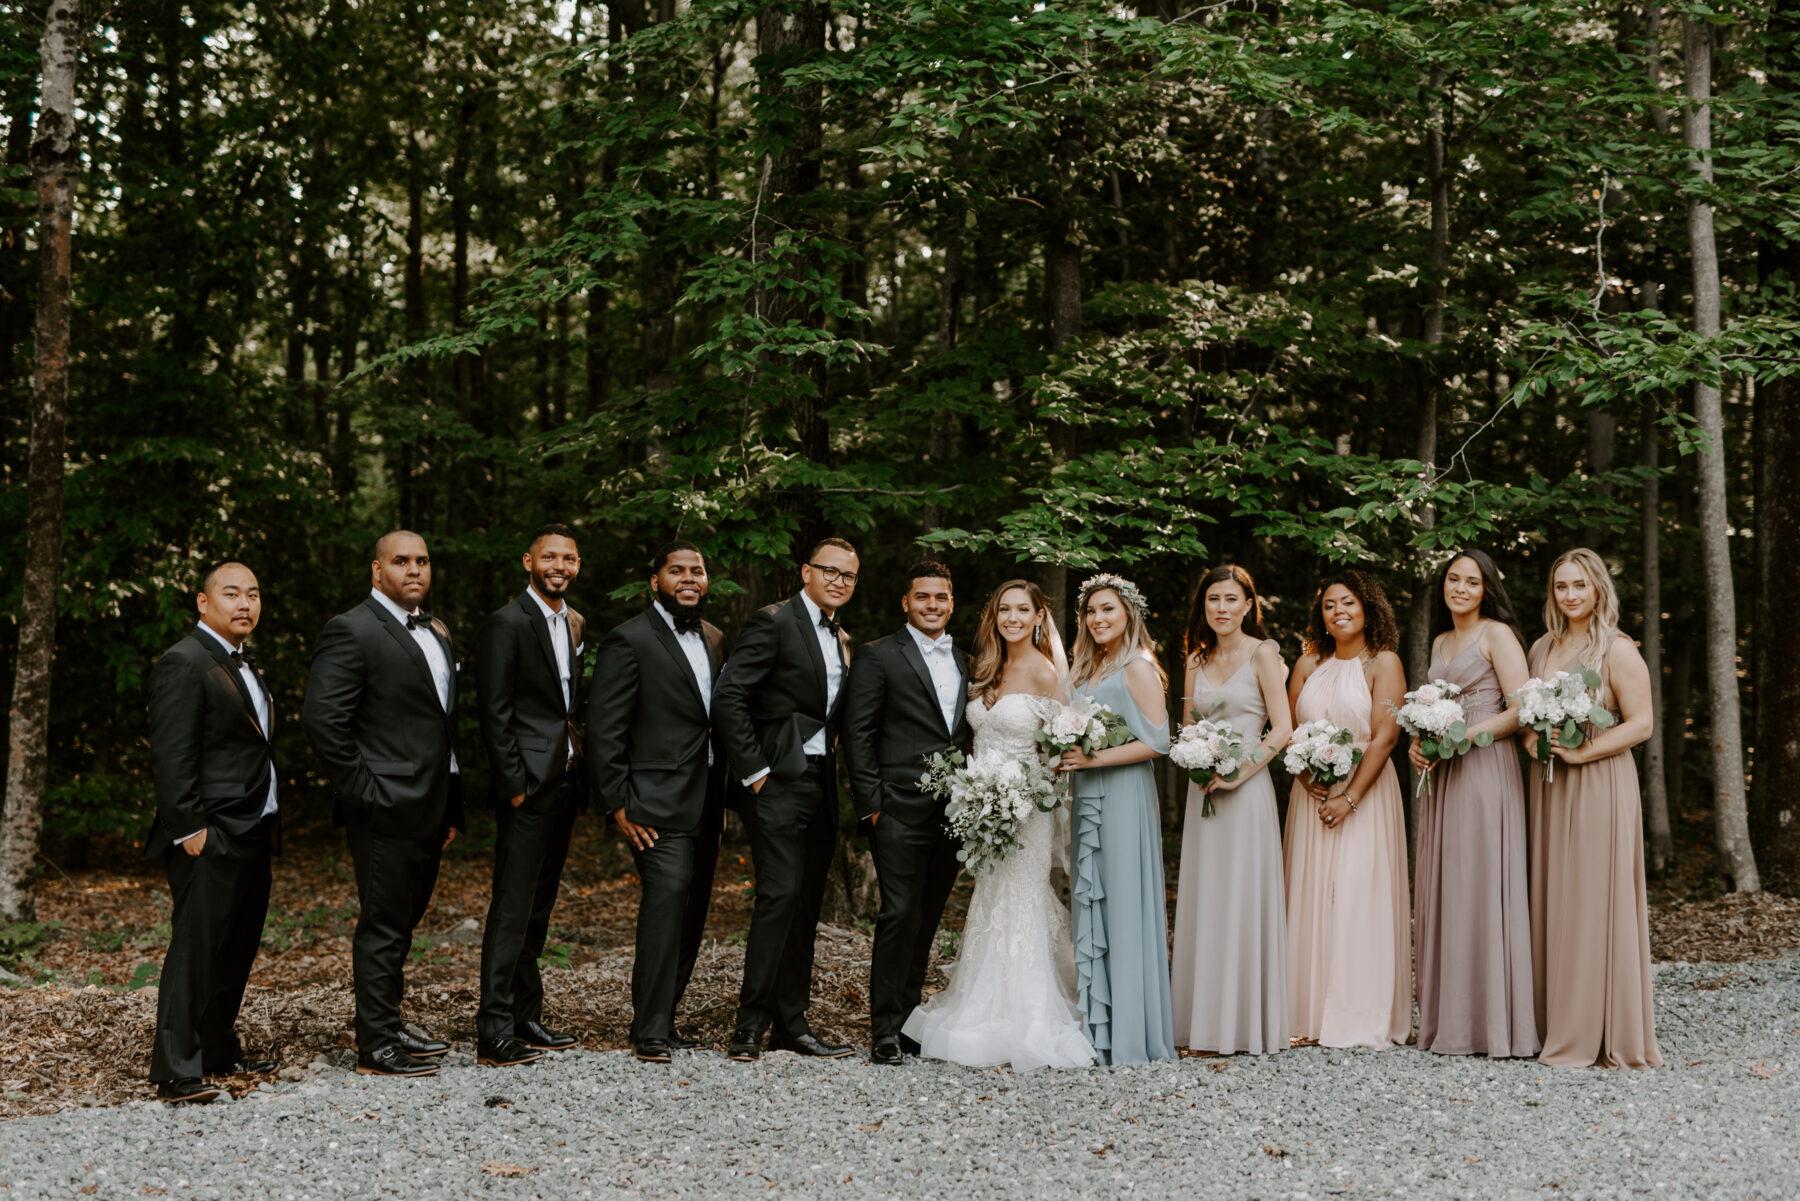 Five Bridge Inn Rehoboth Wedding Katie and Enrique Blueflash Photography 12